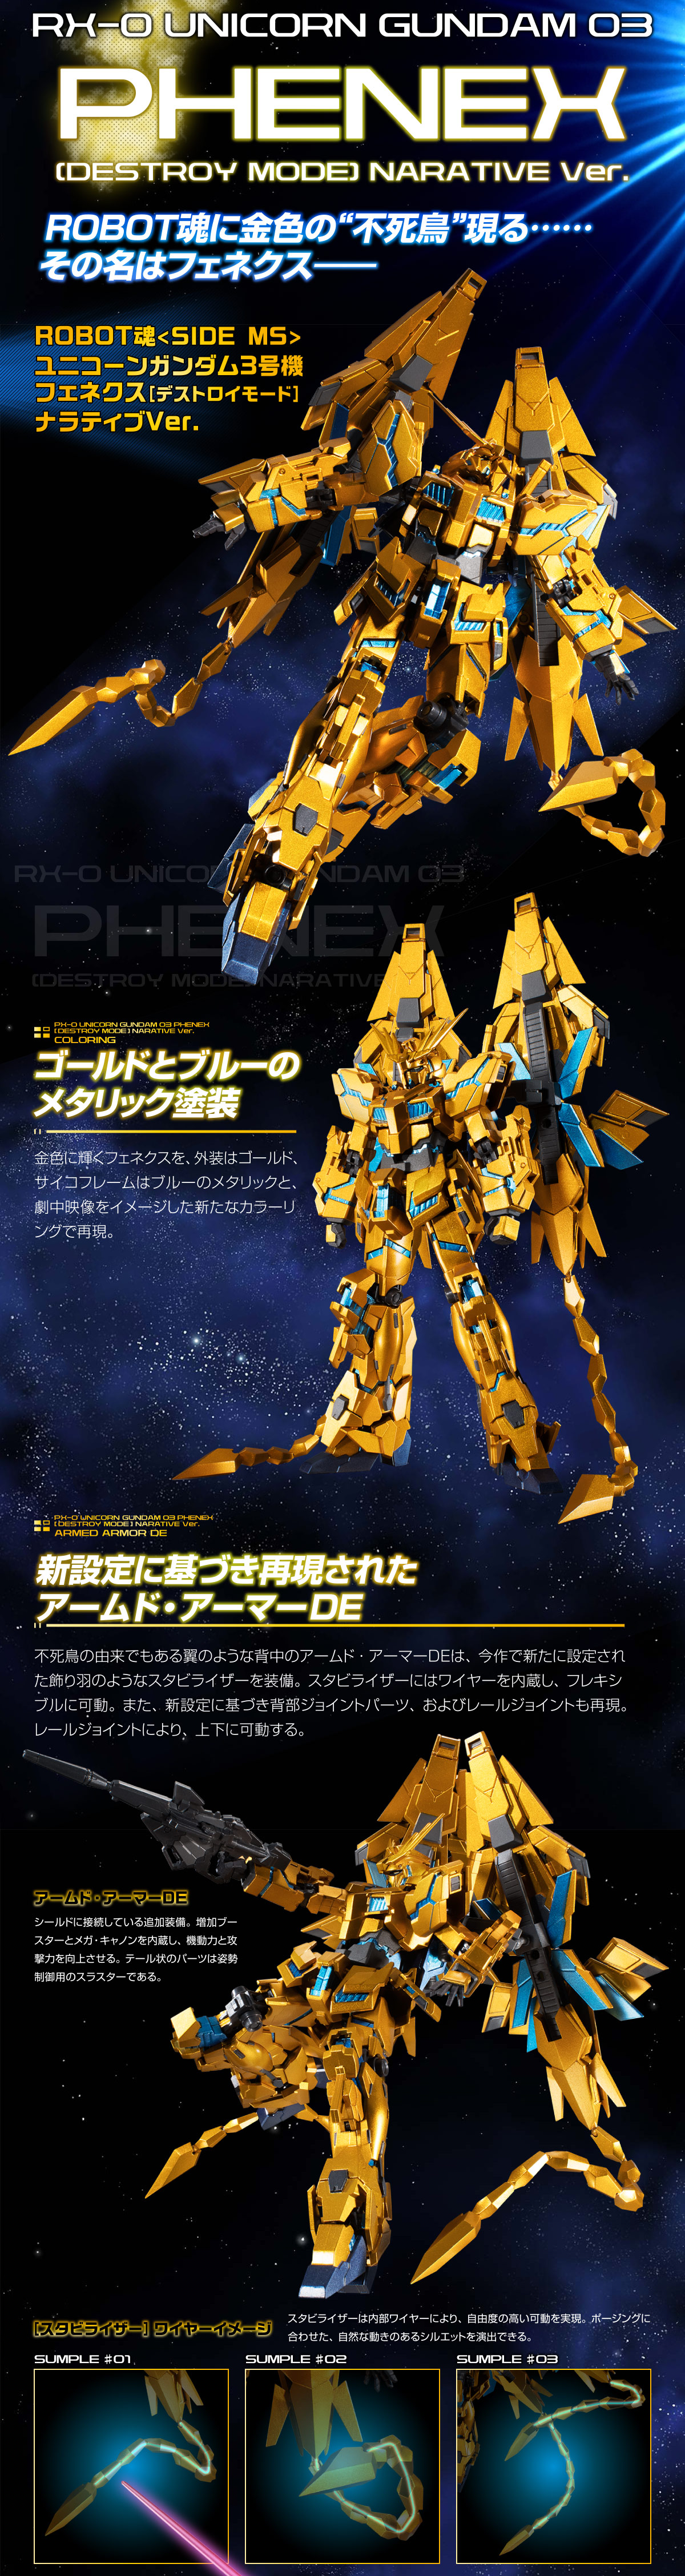 Gundam - Metal Robot Side MS (Bandai) - Page 6 LUZLrYlw_o